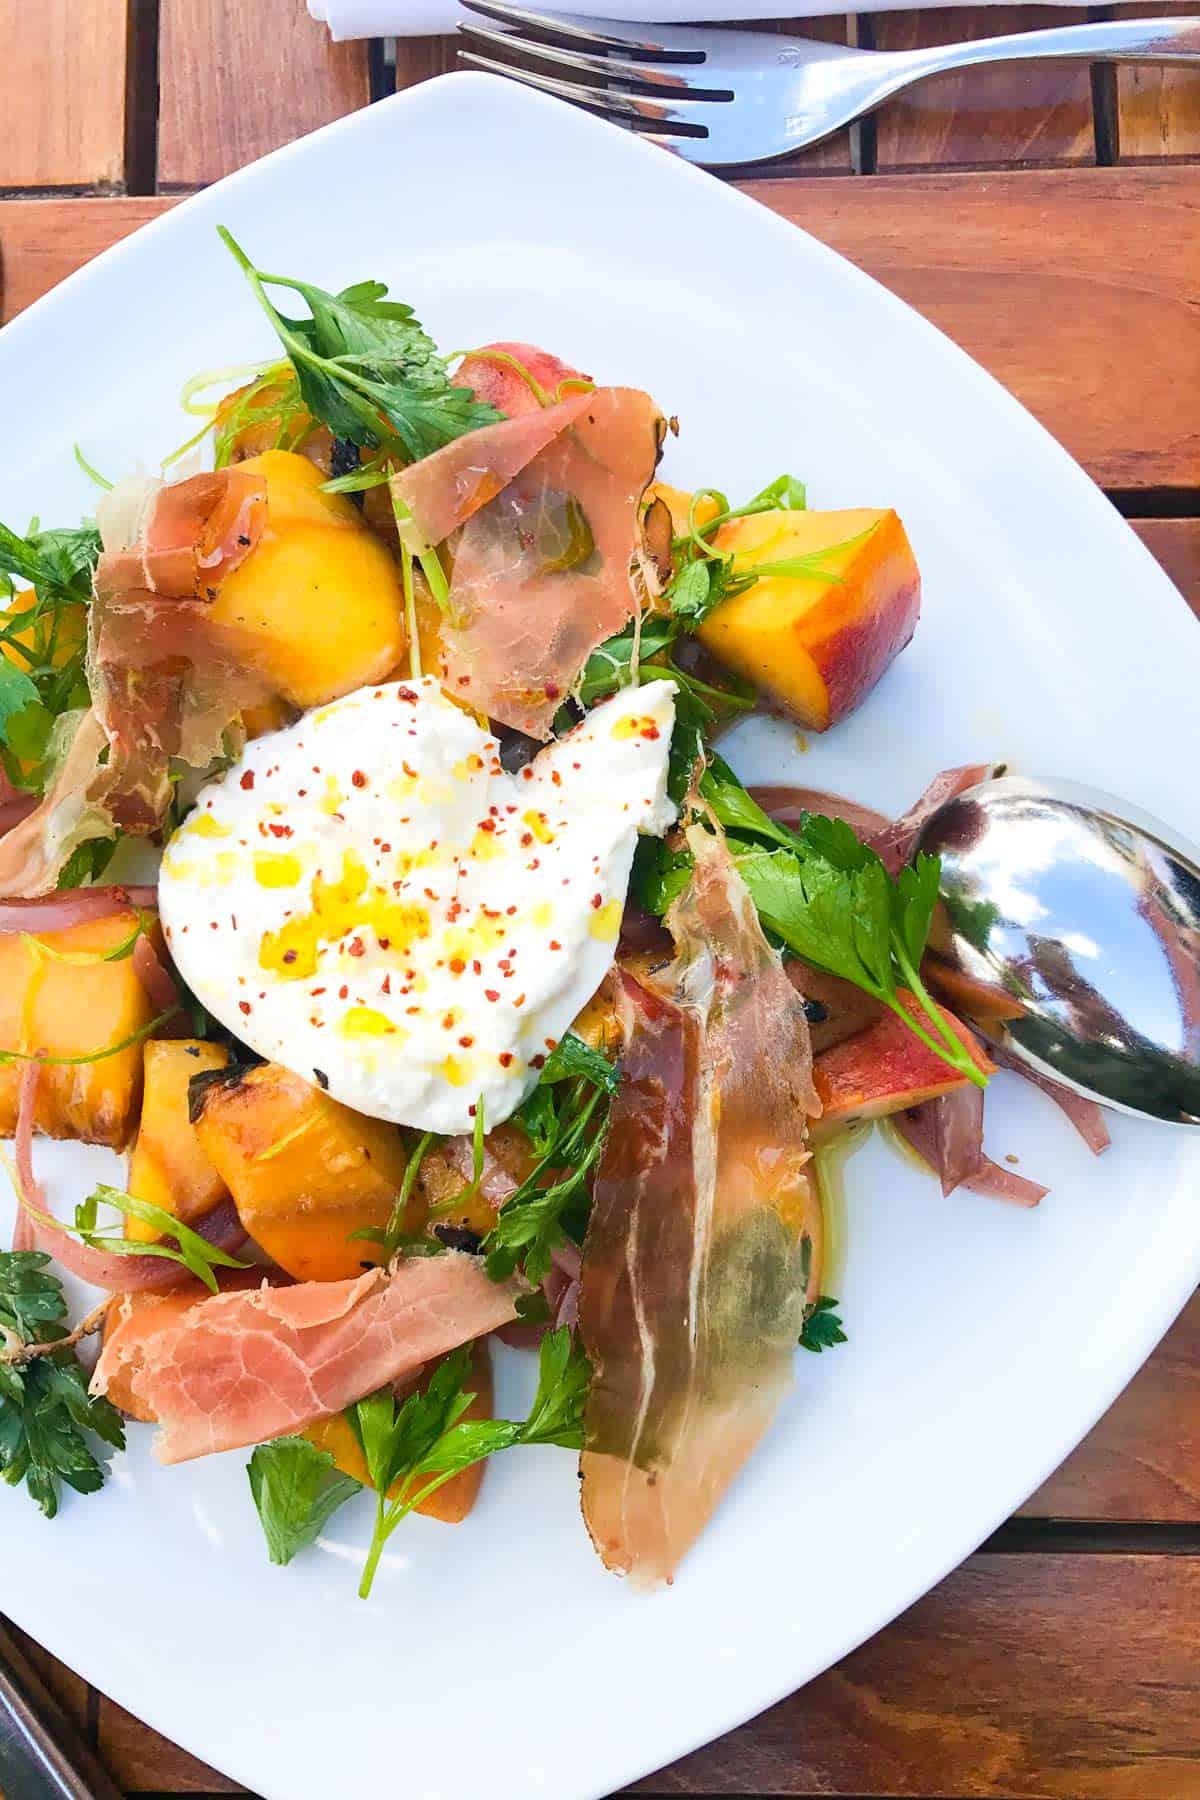 Peach and Burrata Salad from Saffron Mediterranean Kitchen in Walla Walla, Washington